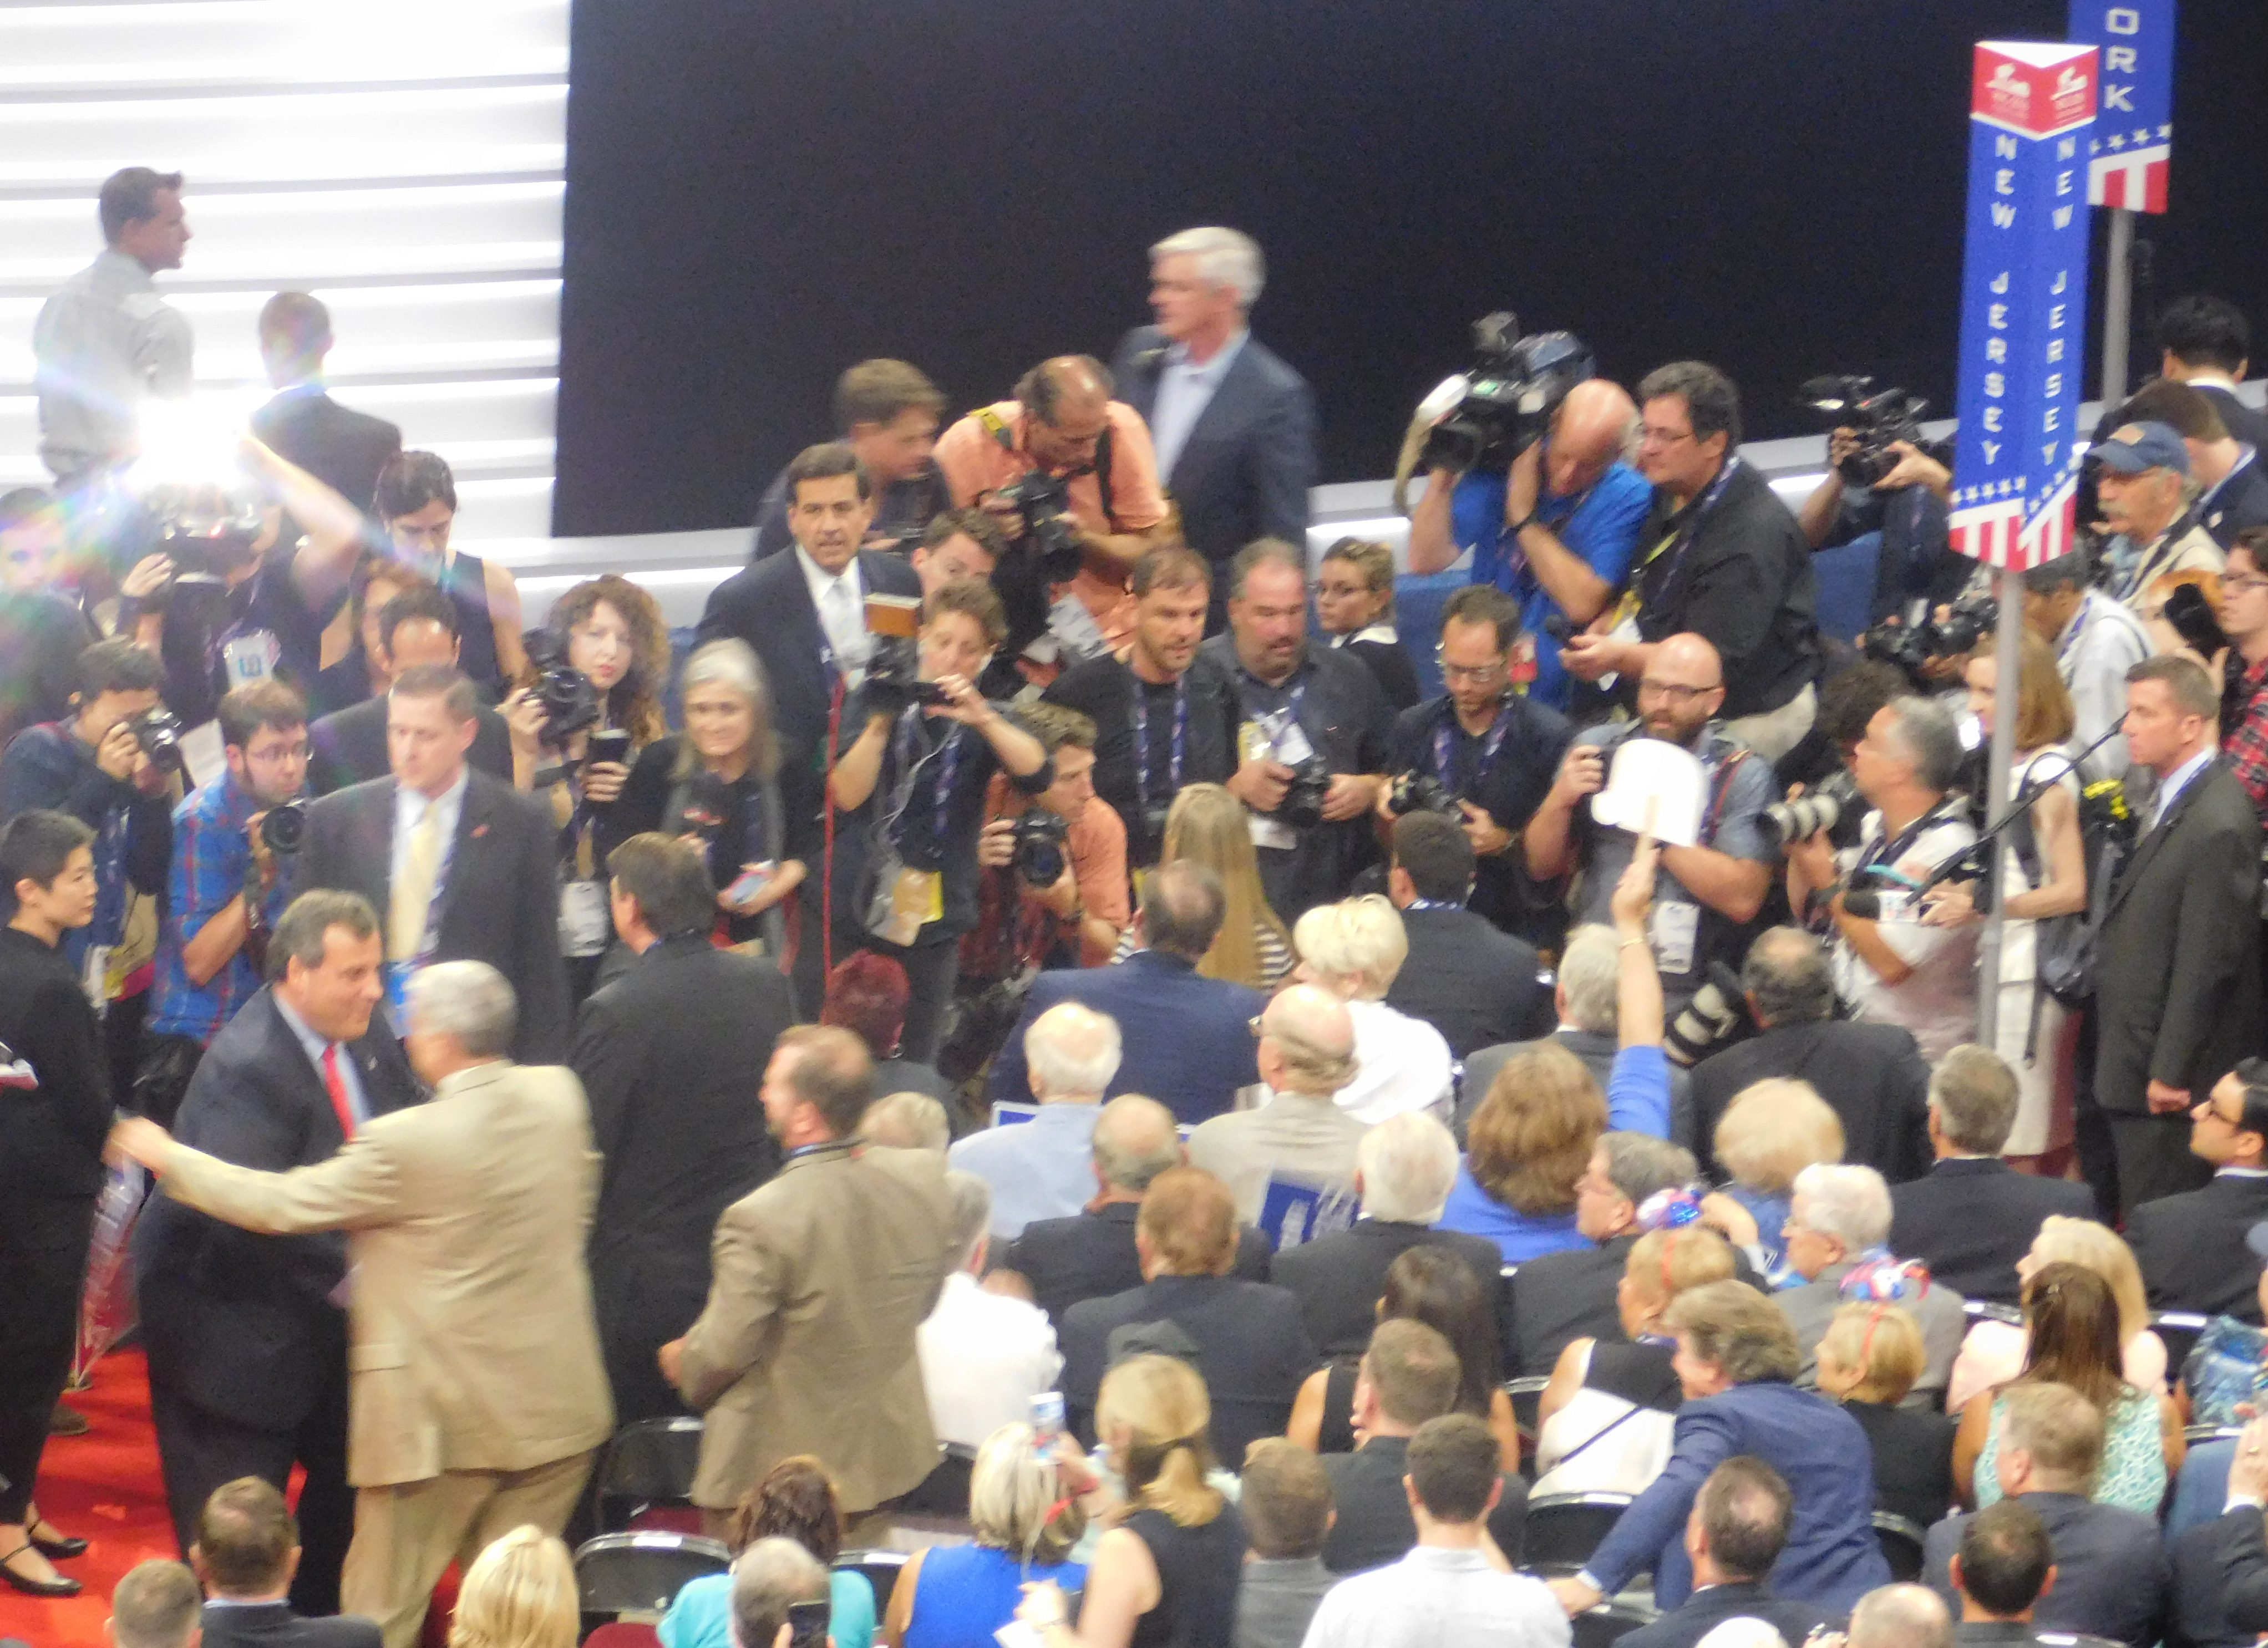 Christie (bottom left) greets members of the NJ delegation.